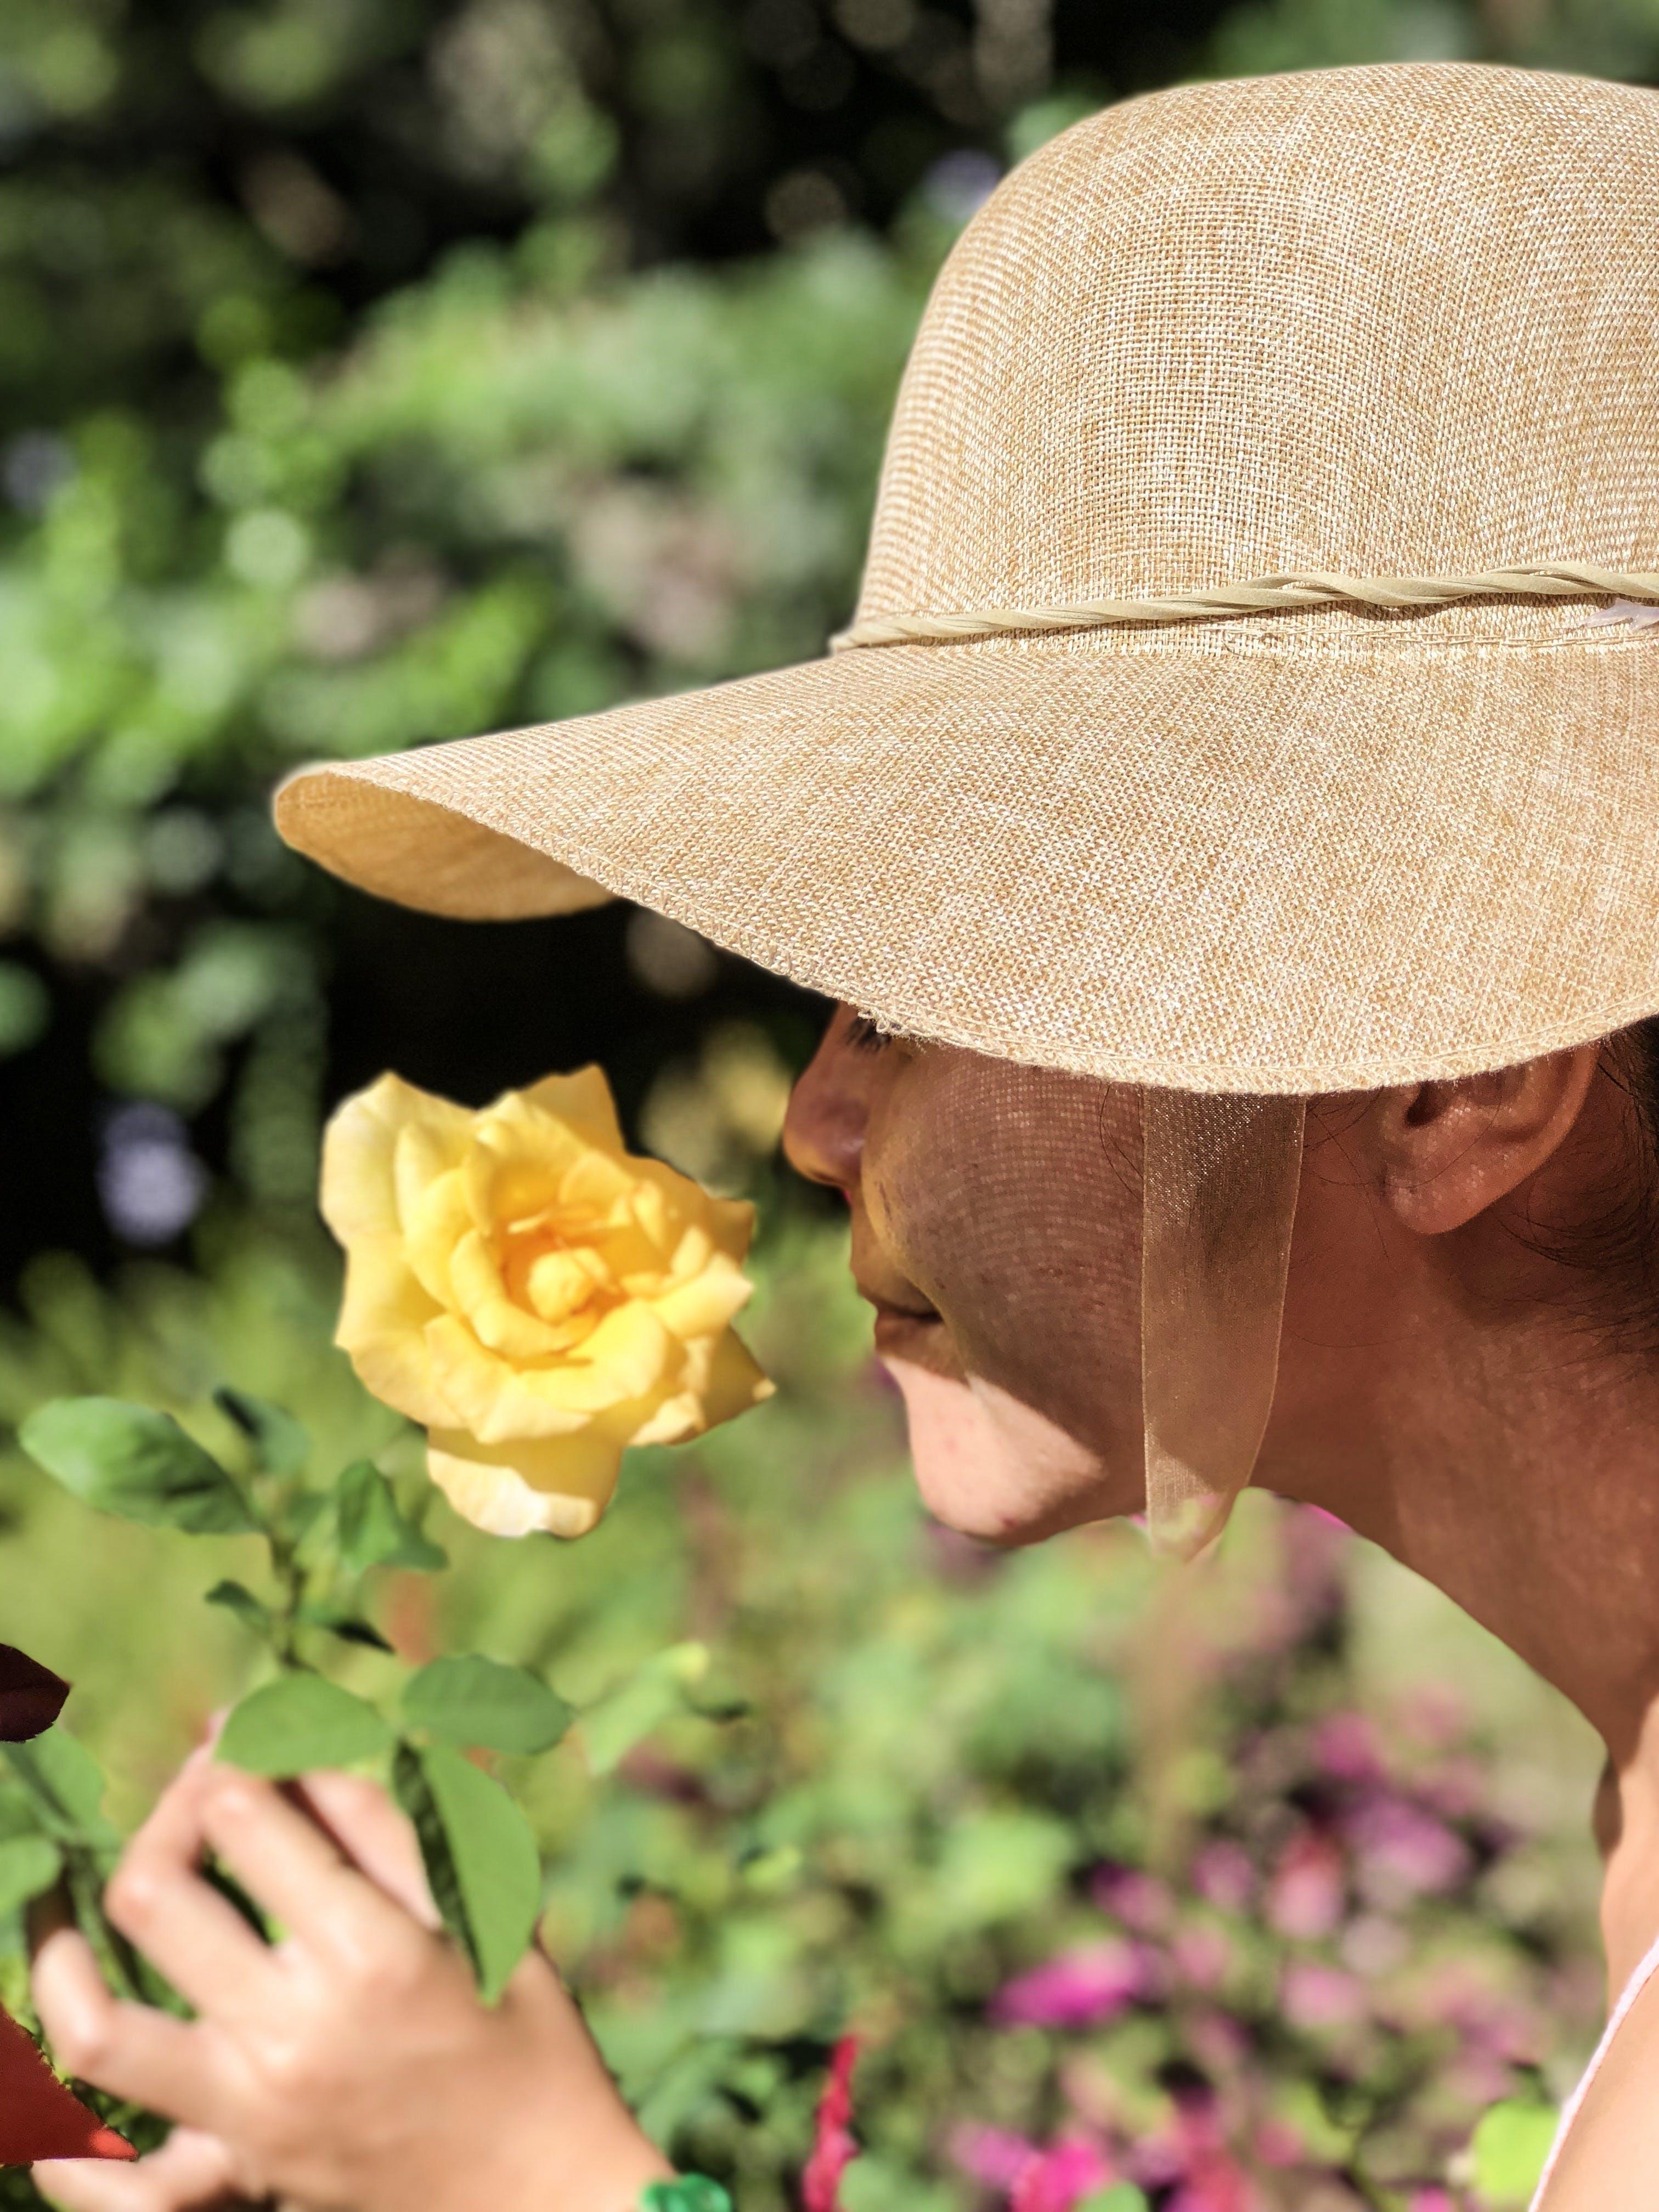 Woman Wearing Sun Hat Smelling Yellow Rose